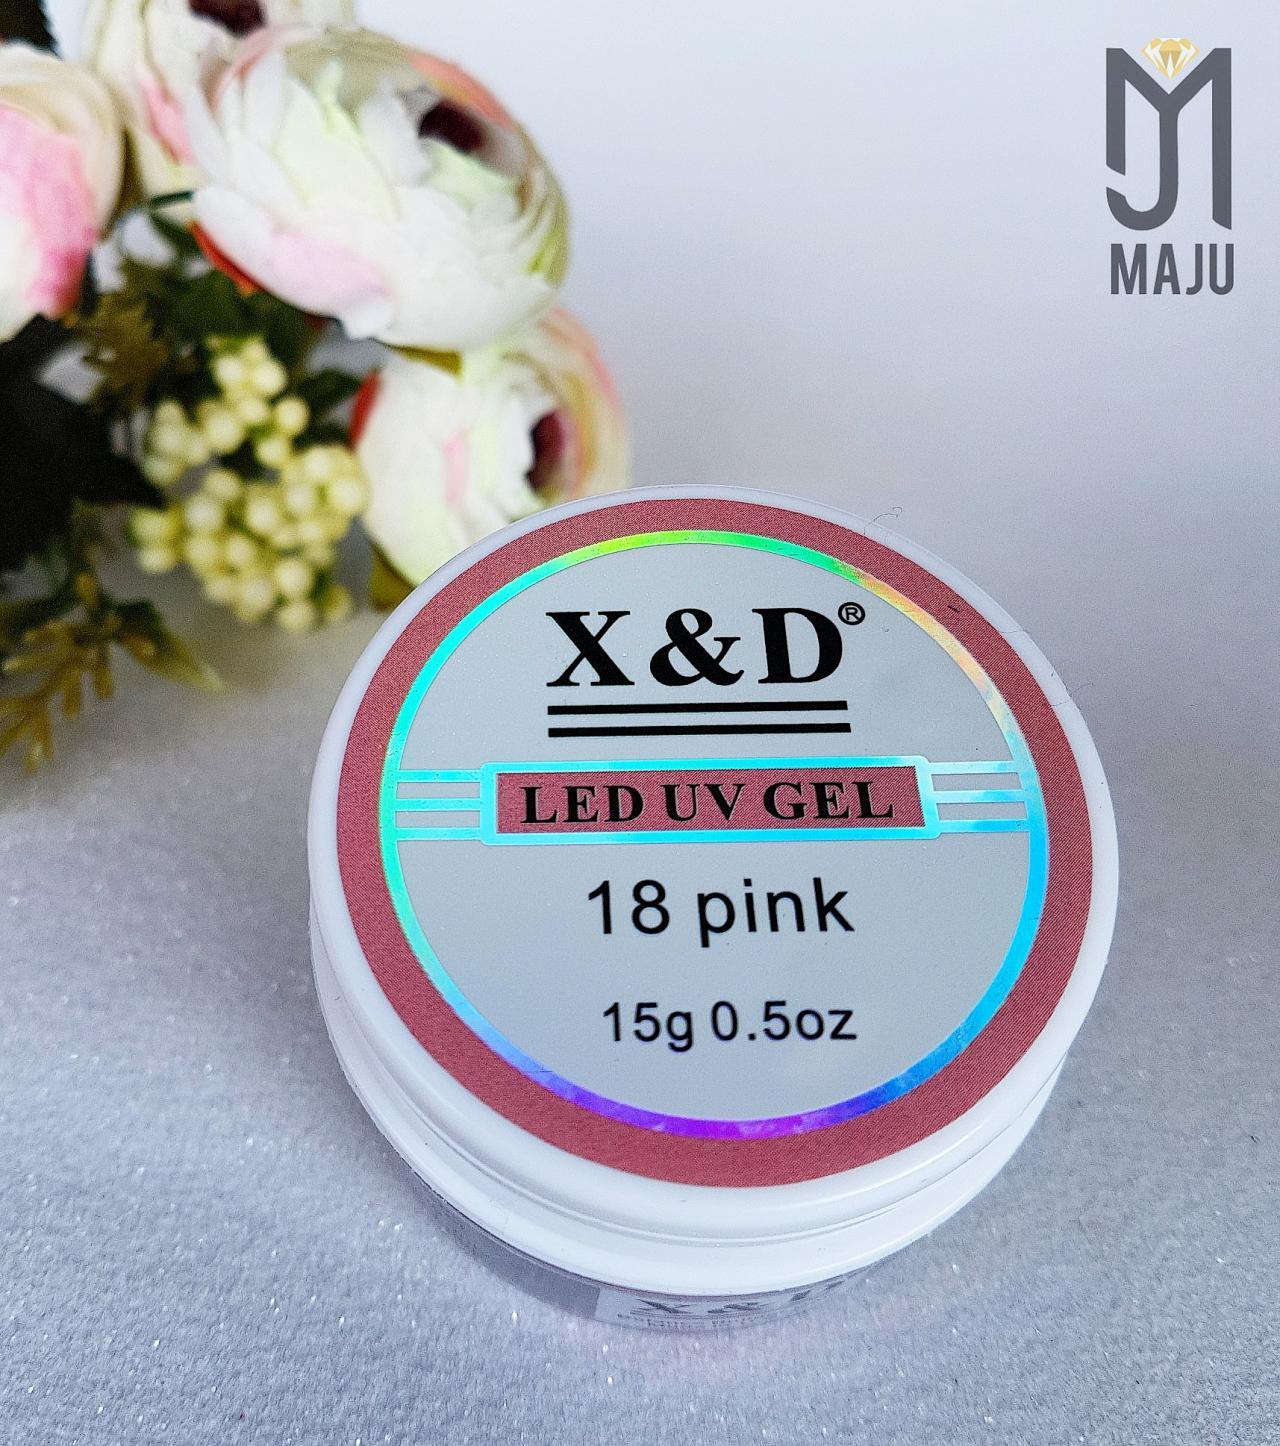 LED UV GEL X&D 18 PINK 15G.